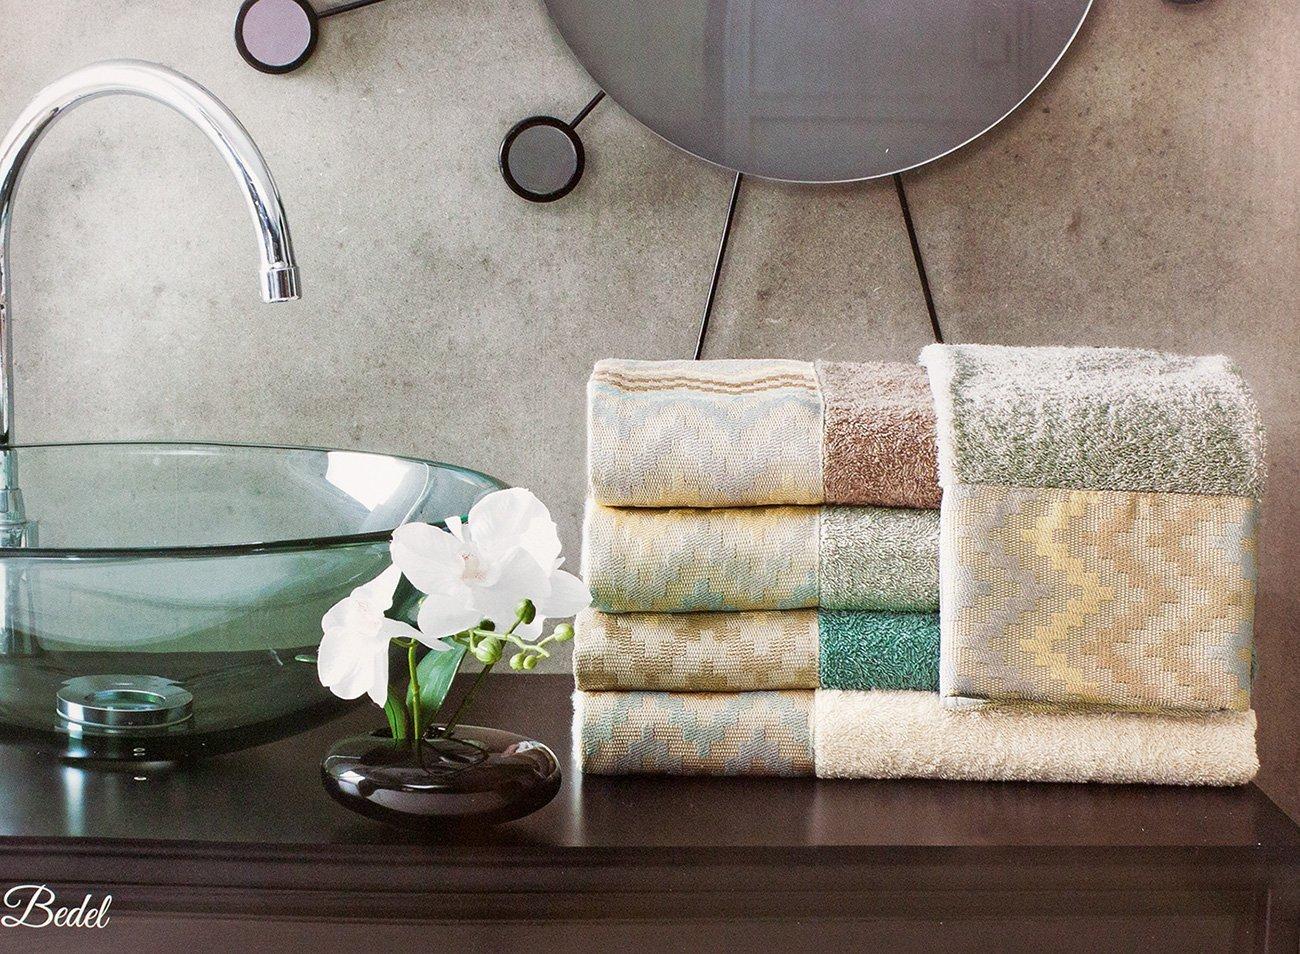 Bedel - комплект махровых полотенец 2шт. La villa